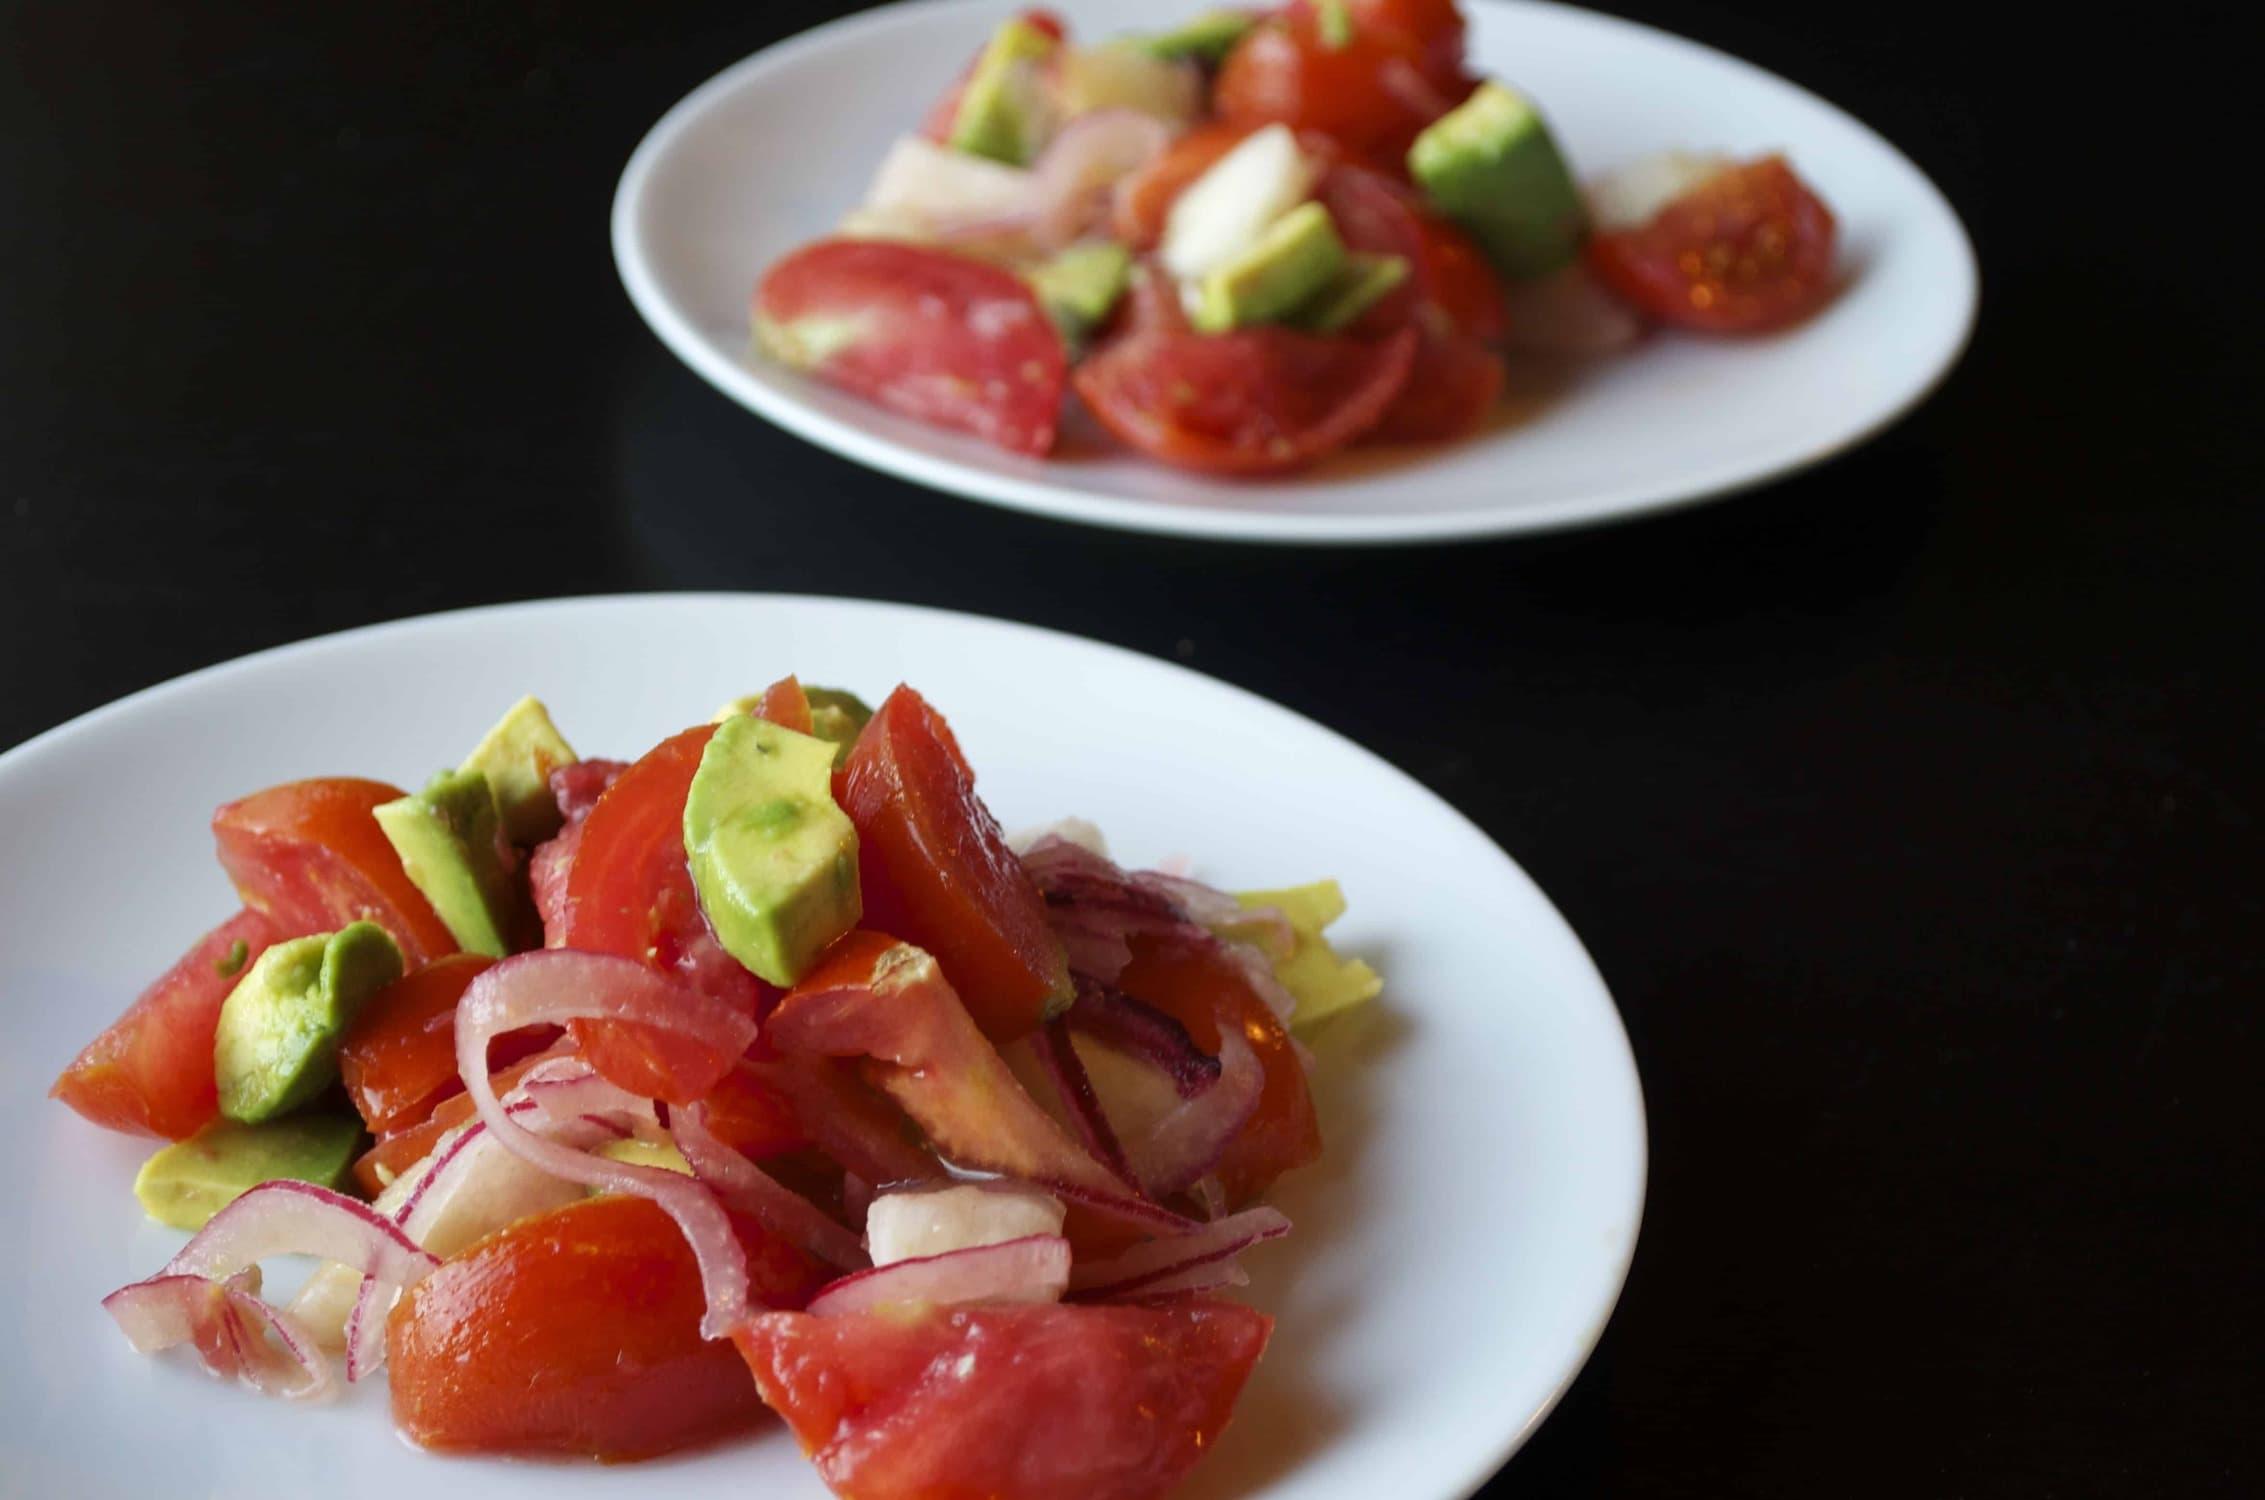 Summer Salads Part 2: White Peach, Tomato & Avocado Salad